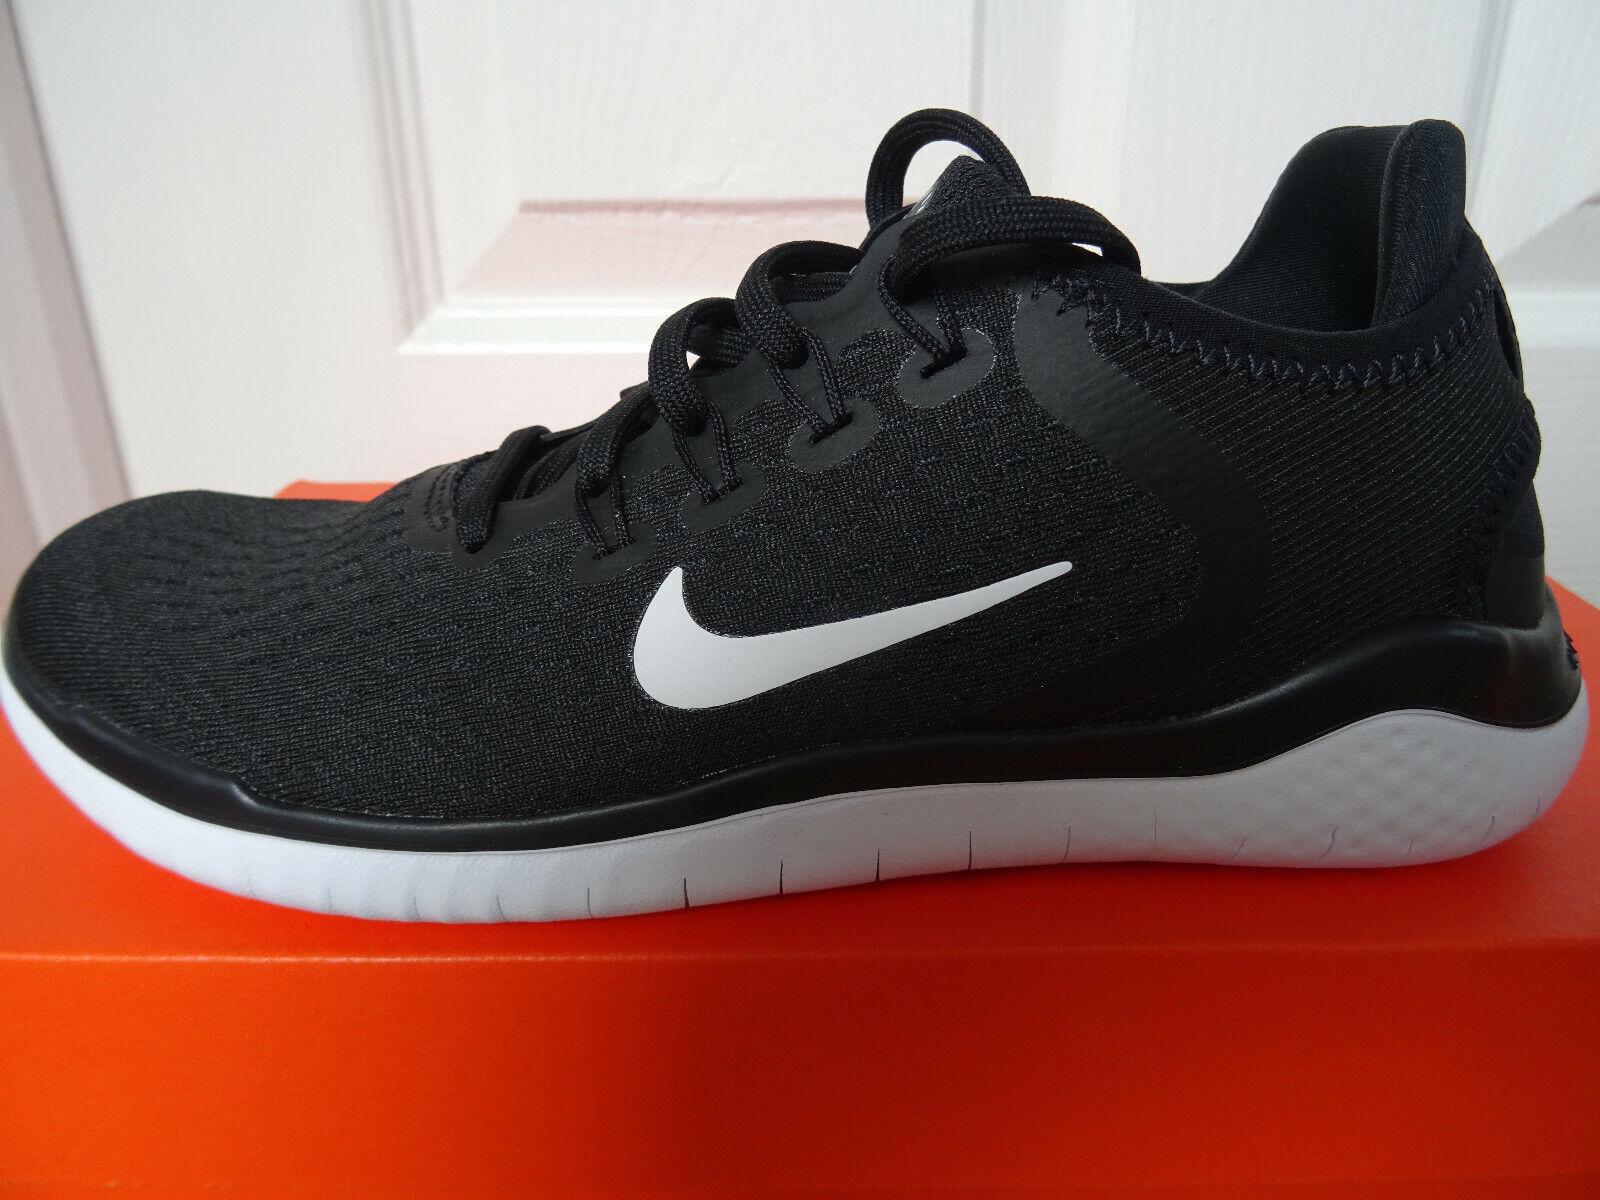 Nike Free RN 2018 damen Trainer Schuhe 942837 001 uk 4 eu 37.5 us 6.5 NEW BOX